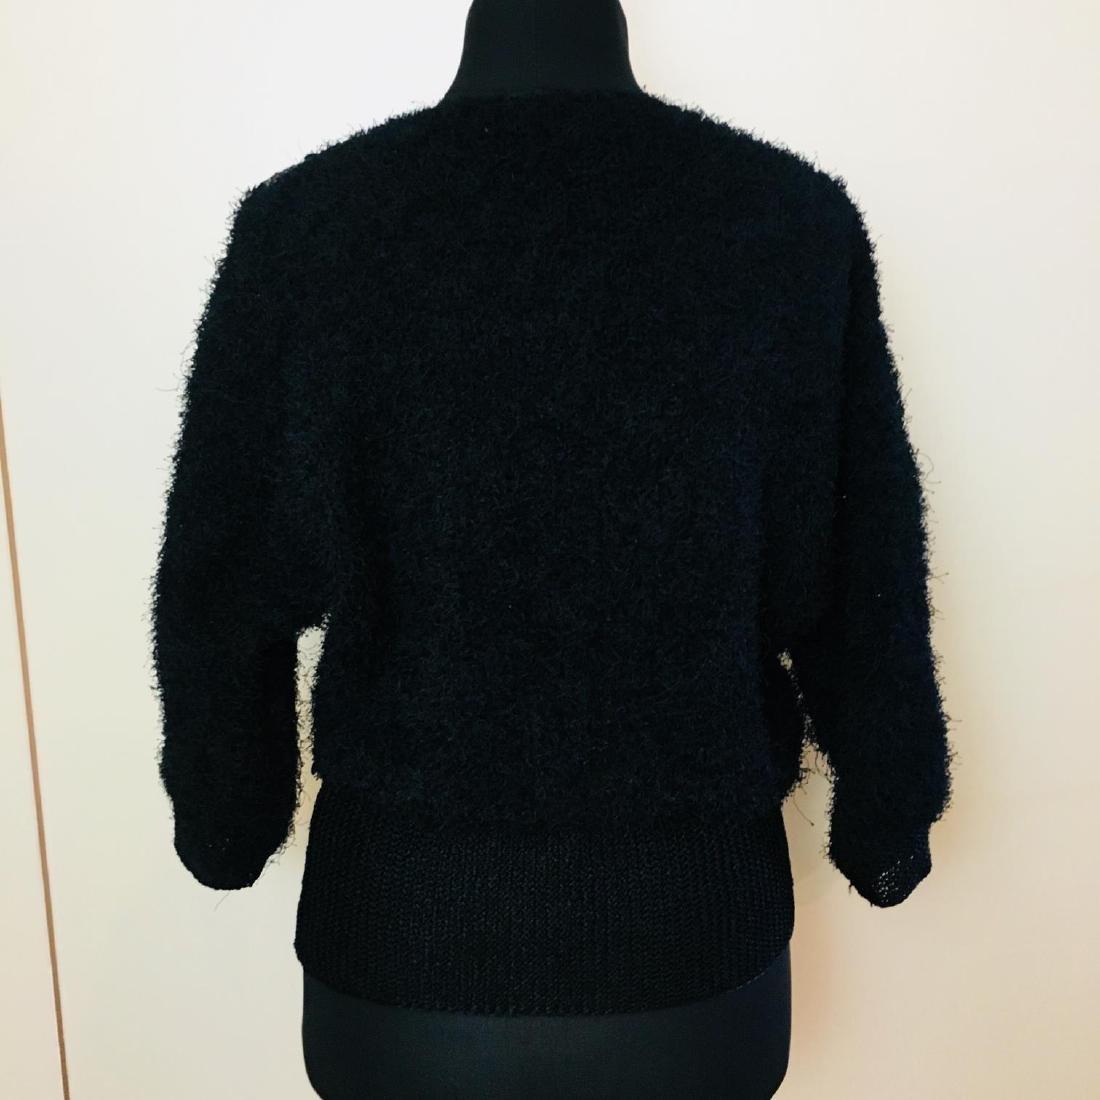 Vintage Women's Fluffy Sweater Jumper Size US 10 - 5